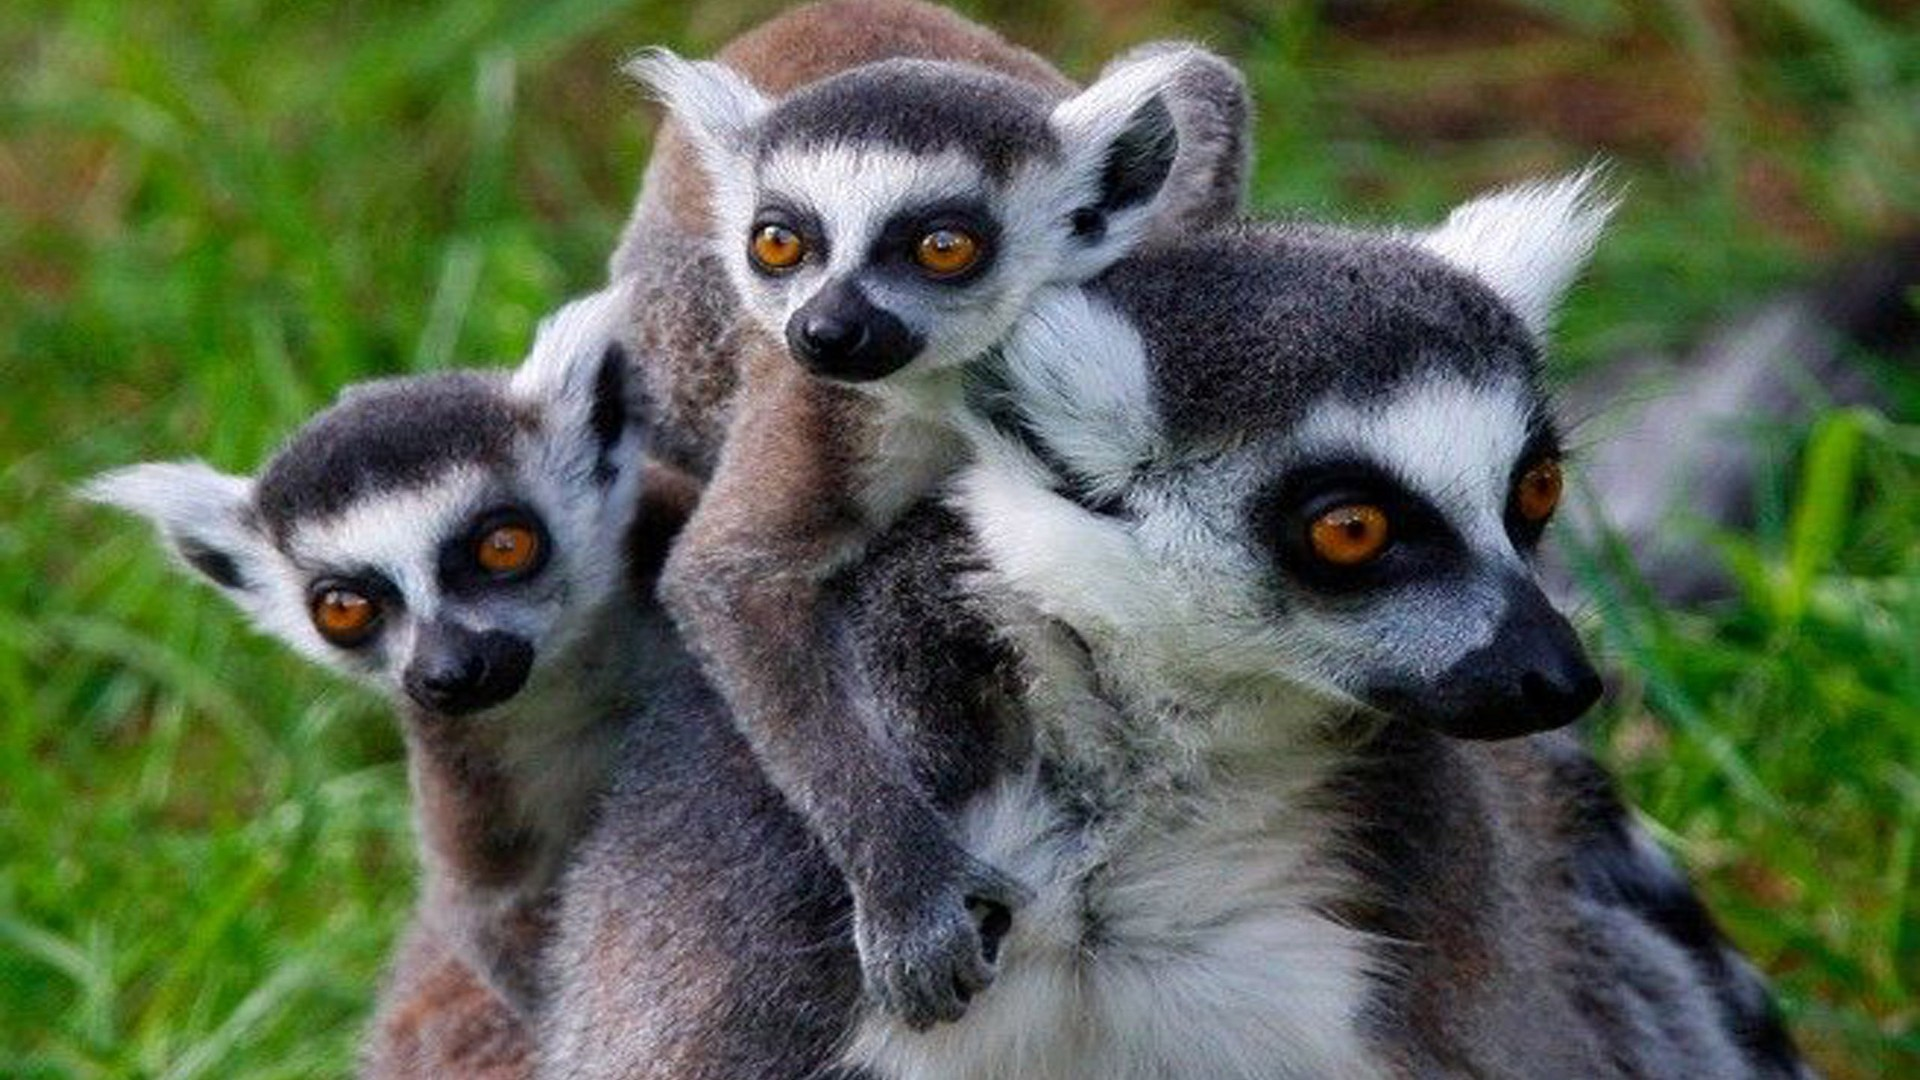 PhotoFly Travel Club | Madagascar Lemurs | PhotoFly Travel Club